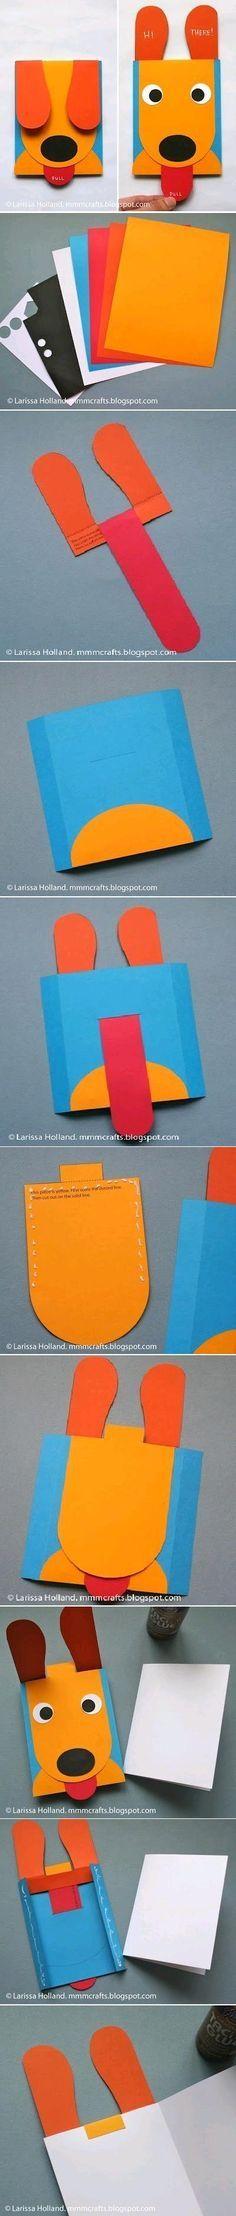 Tarjetas perro, divertida idea para un regalo - Dog cards, fun idea for a gift.